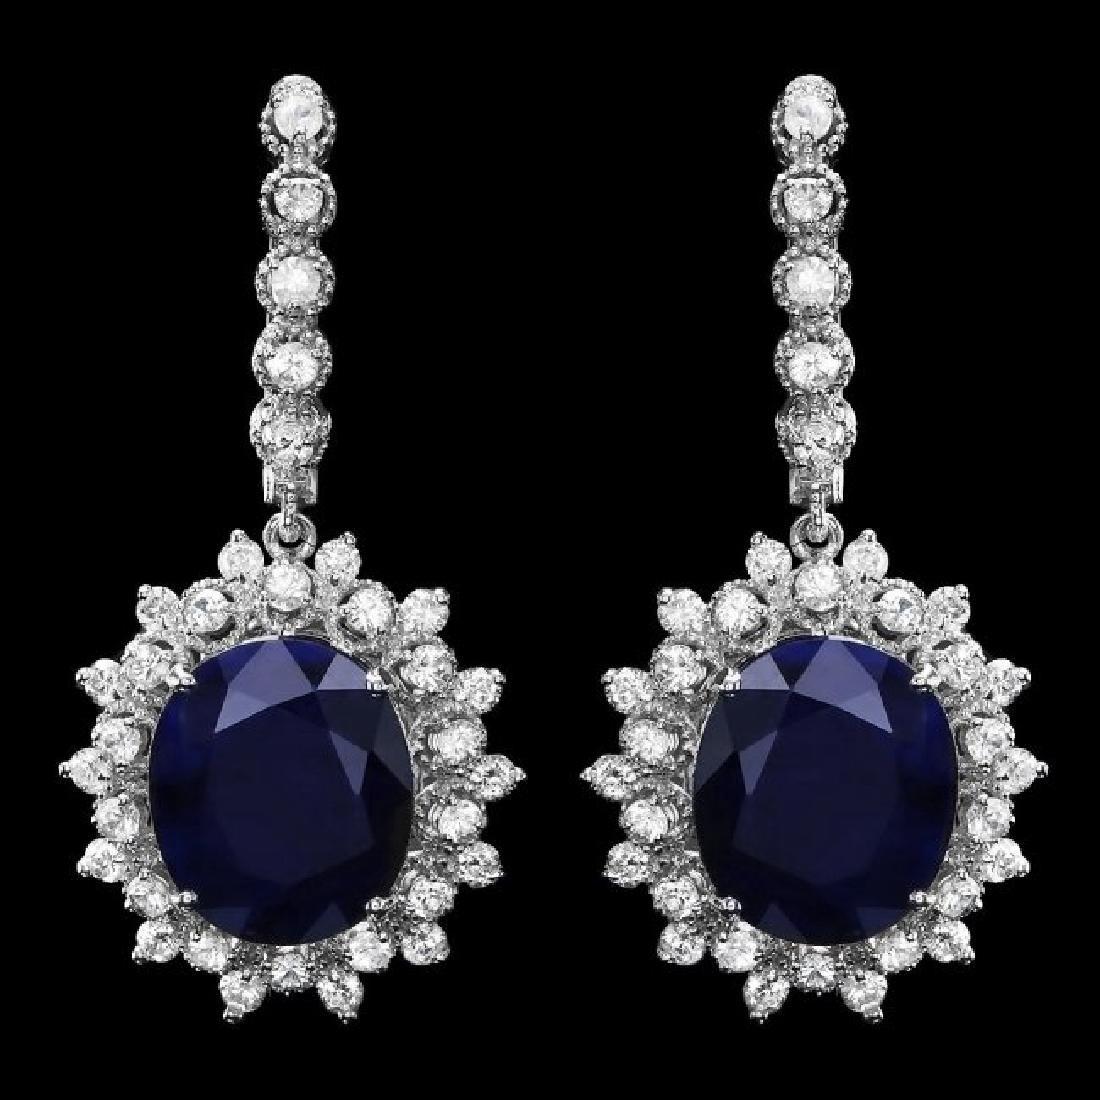 14k Gold 14ct Sapphire 2.00ct Diamond Earrings